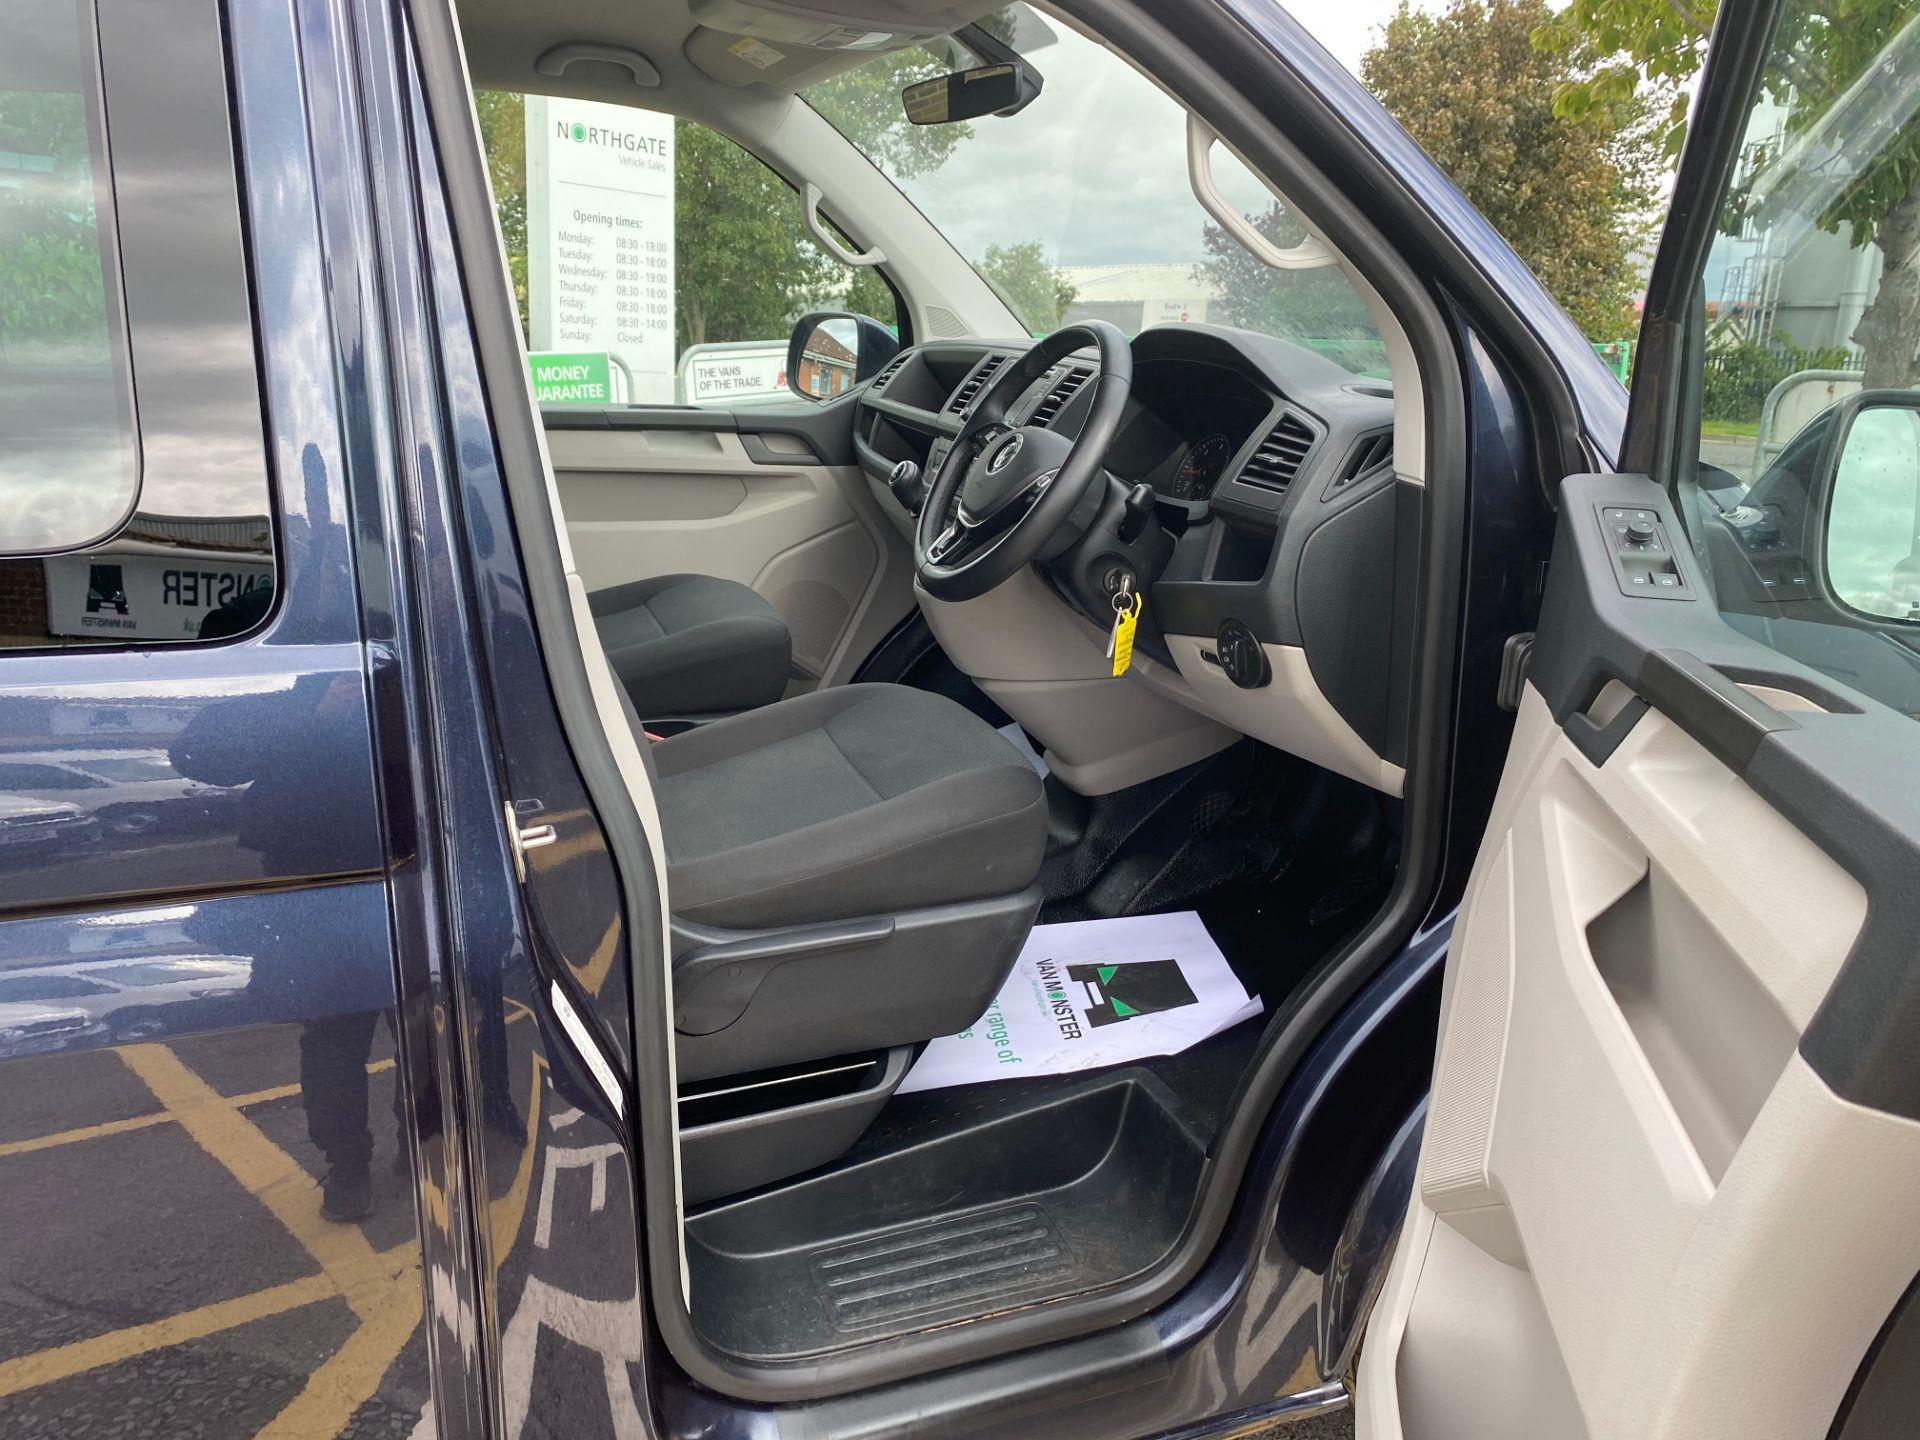 2019 Volkswagen Transporter 2.0 Tdi Bmt 150 Highline Kombi Van (GH19NUO) Image 11